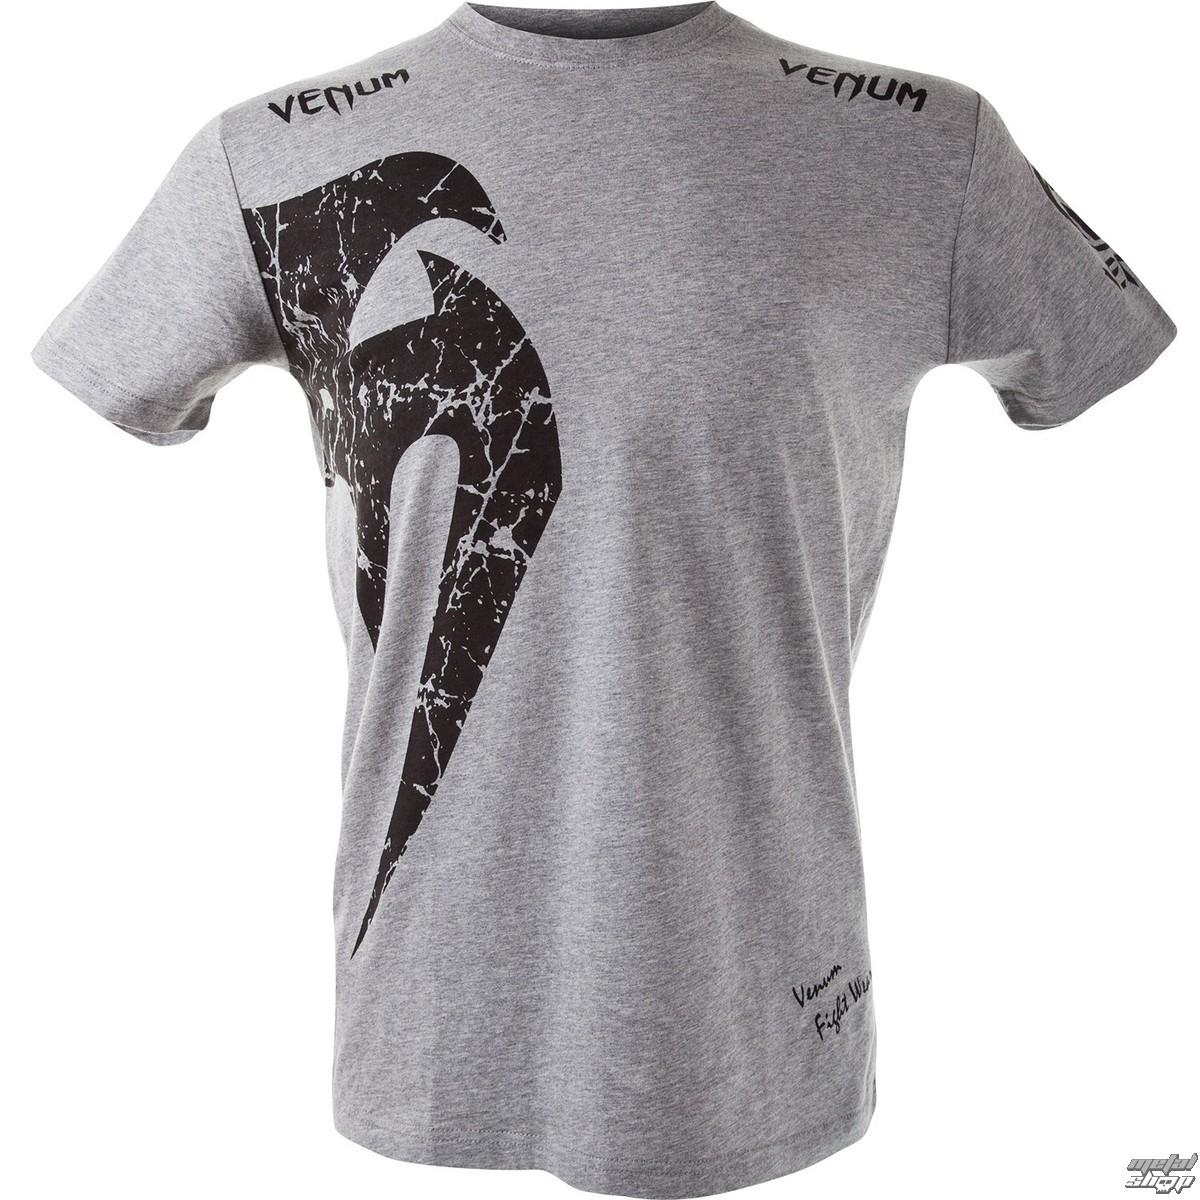 tričko pánské VENUM - Giant - Grey/Black - EU-VENUM-1324